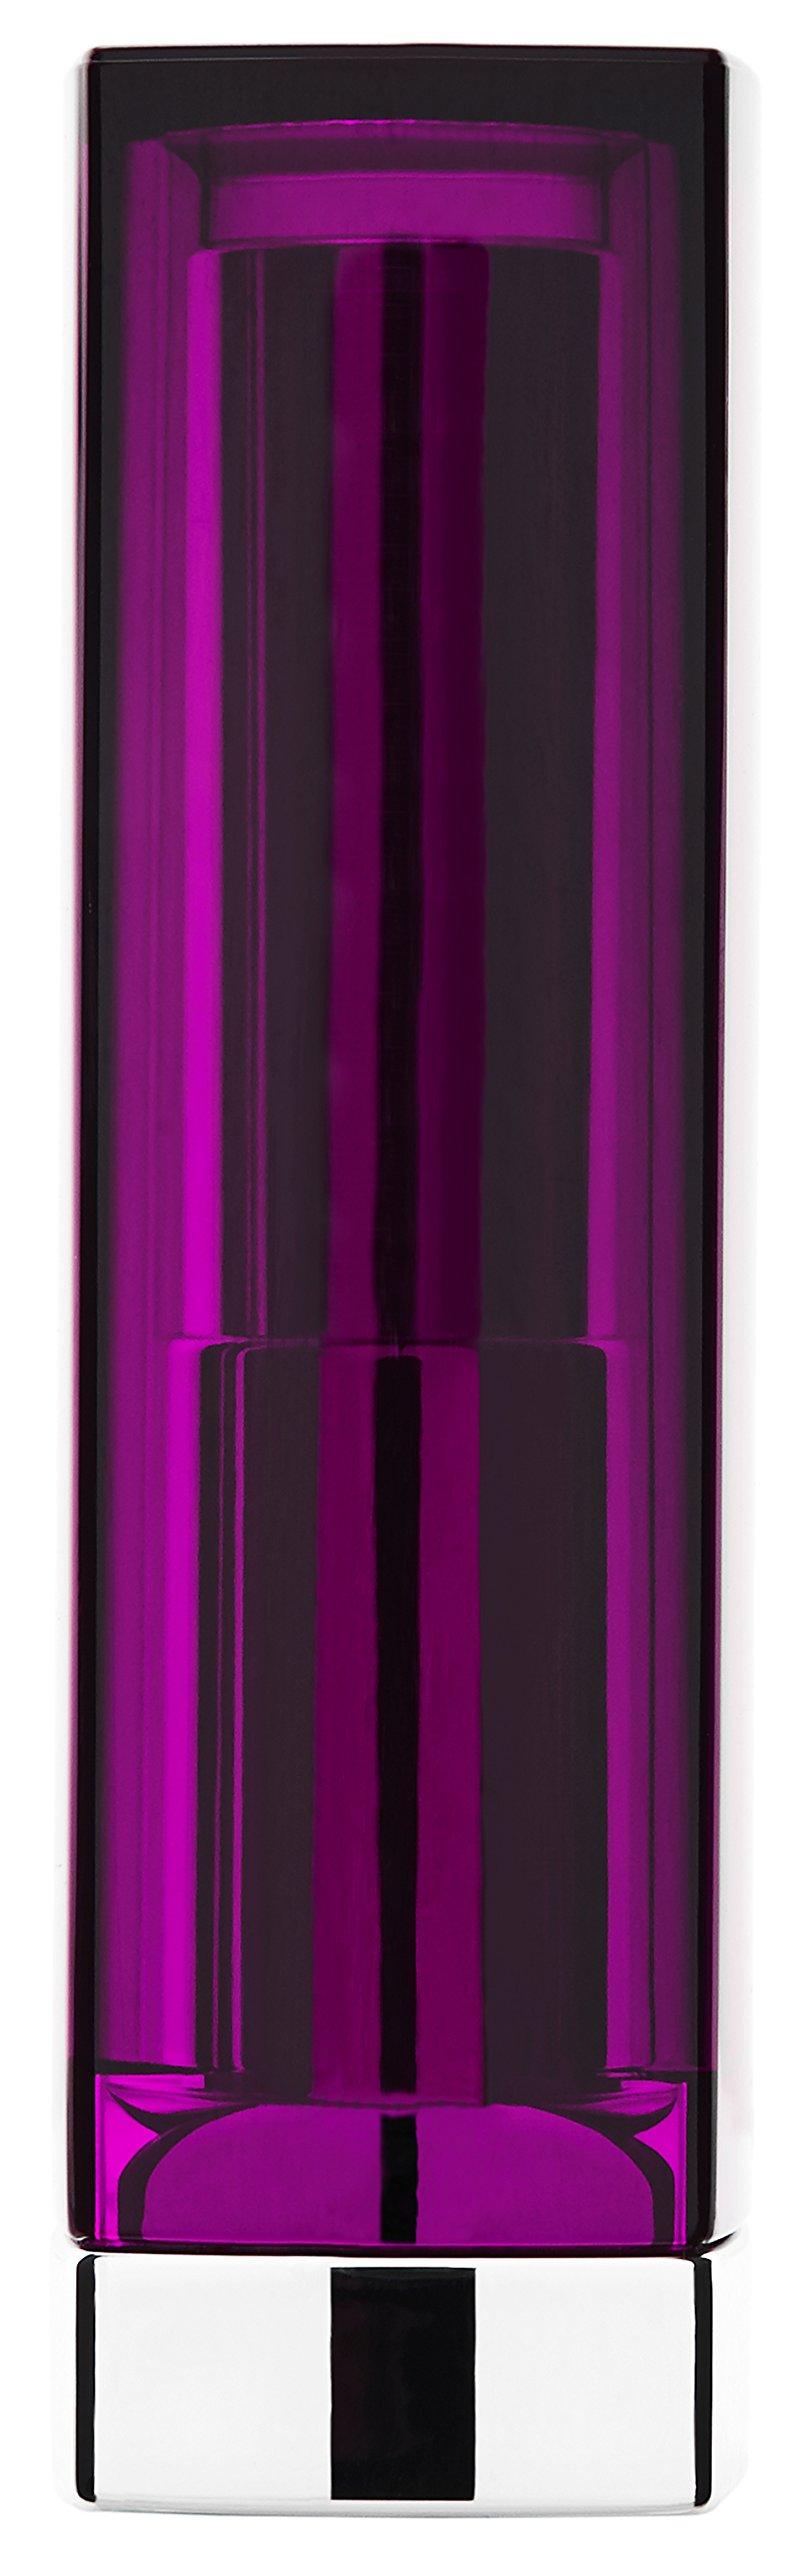 Maybelline Color Sensational 338 Midnight Plum – barras de labios (Violeta, Midnight Plum, Francia)